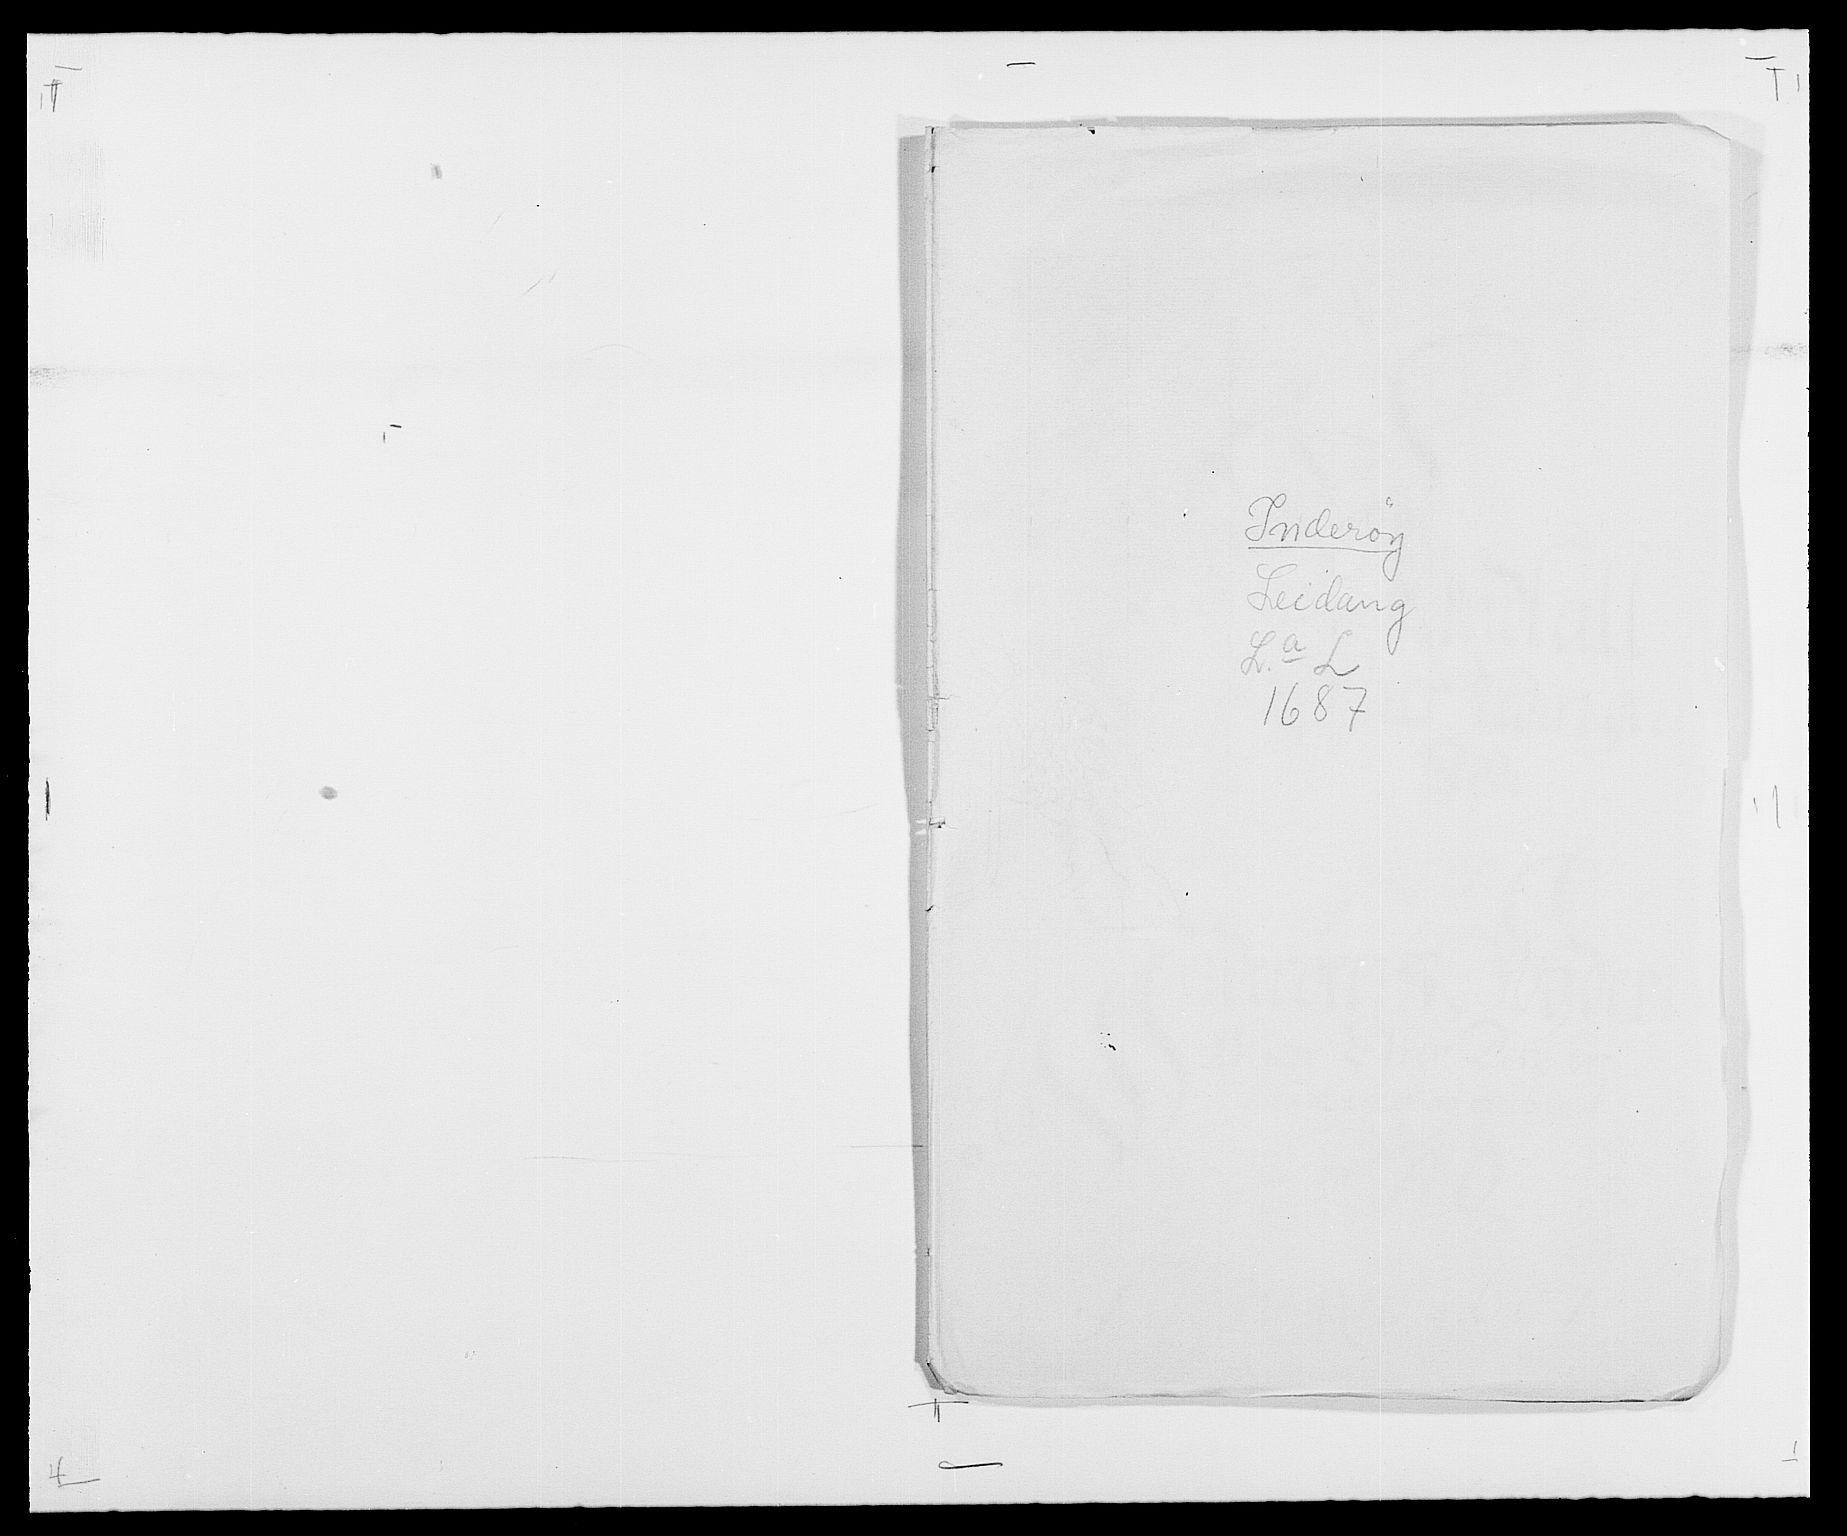 RA, Rentekammeret inntil 1814, Reviderte regnskaper, Fogderegnskap, R63/L4306: Fogderegnskap Inderøy, 1687-1689, s. 144